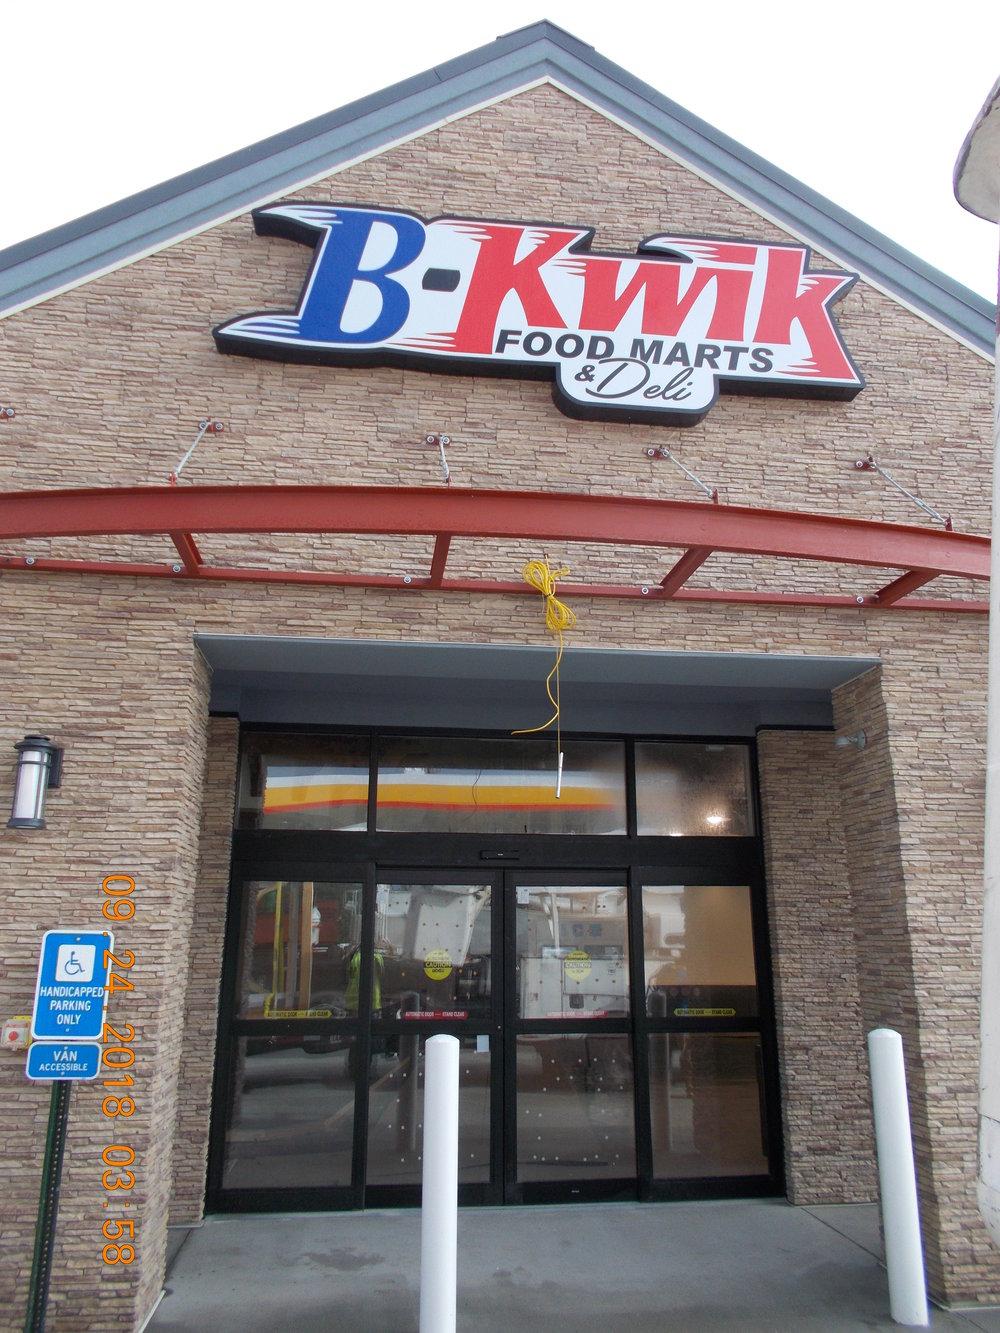 Buffalo Services_BKwik #15_6290 Highway 98_Hattiesburg, MS (26).JPG